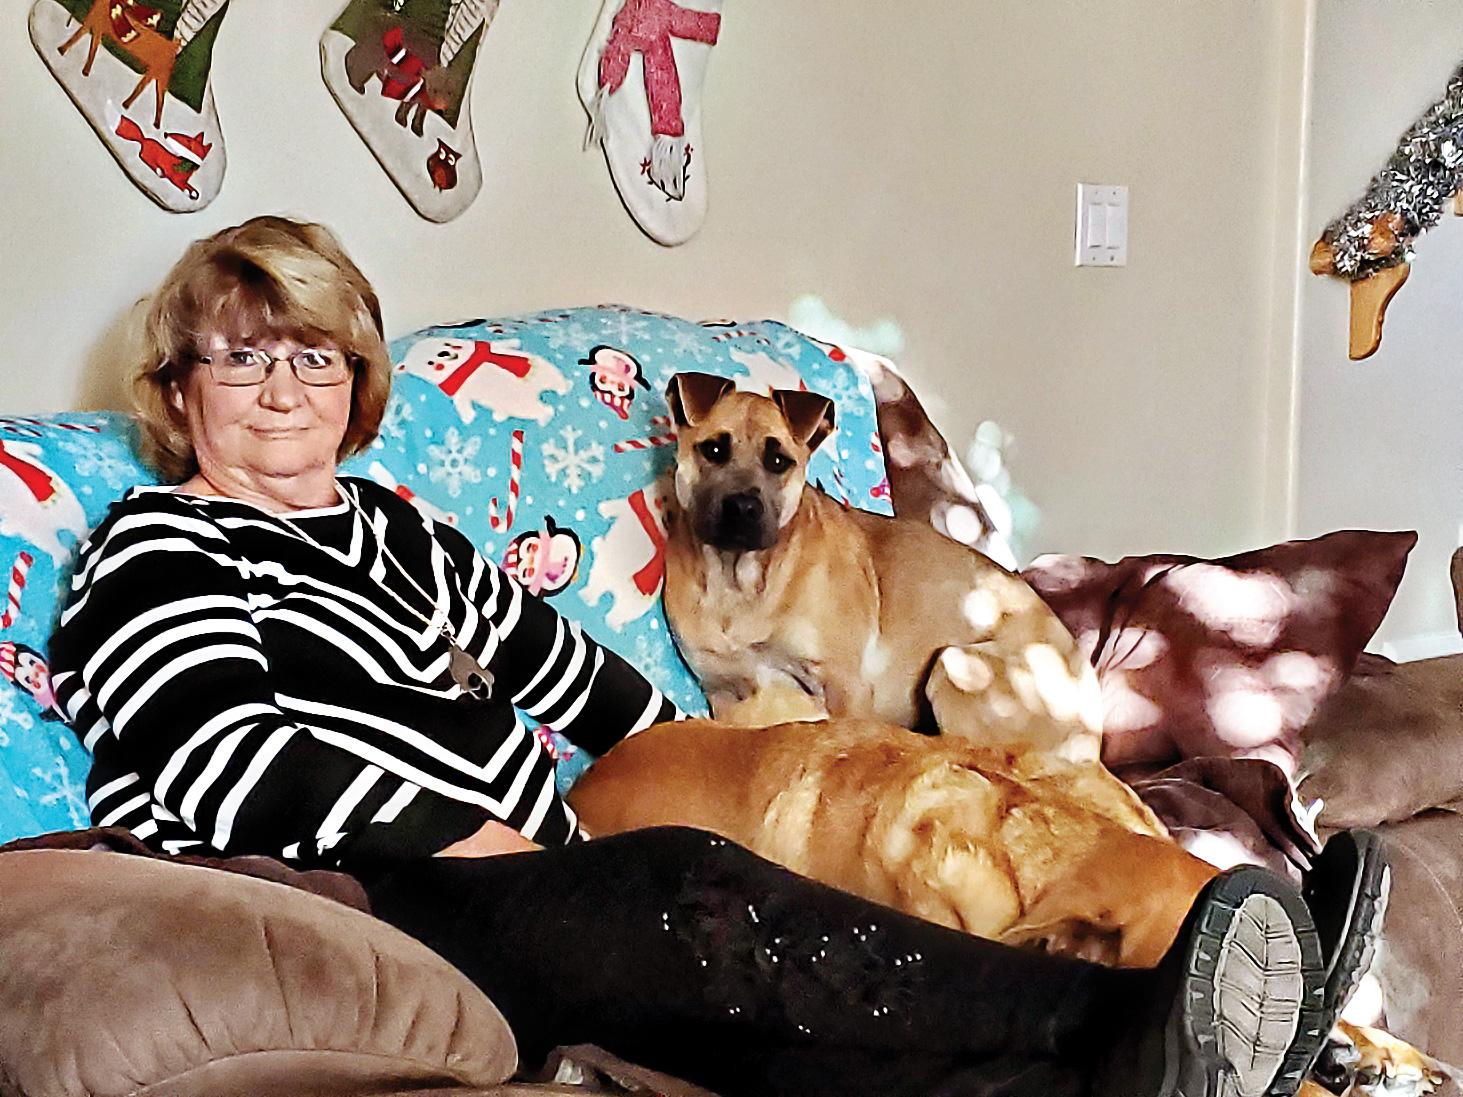 Eileen Depka babysitting grand dogs (Photo by Jeff Depka)